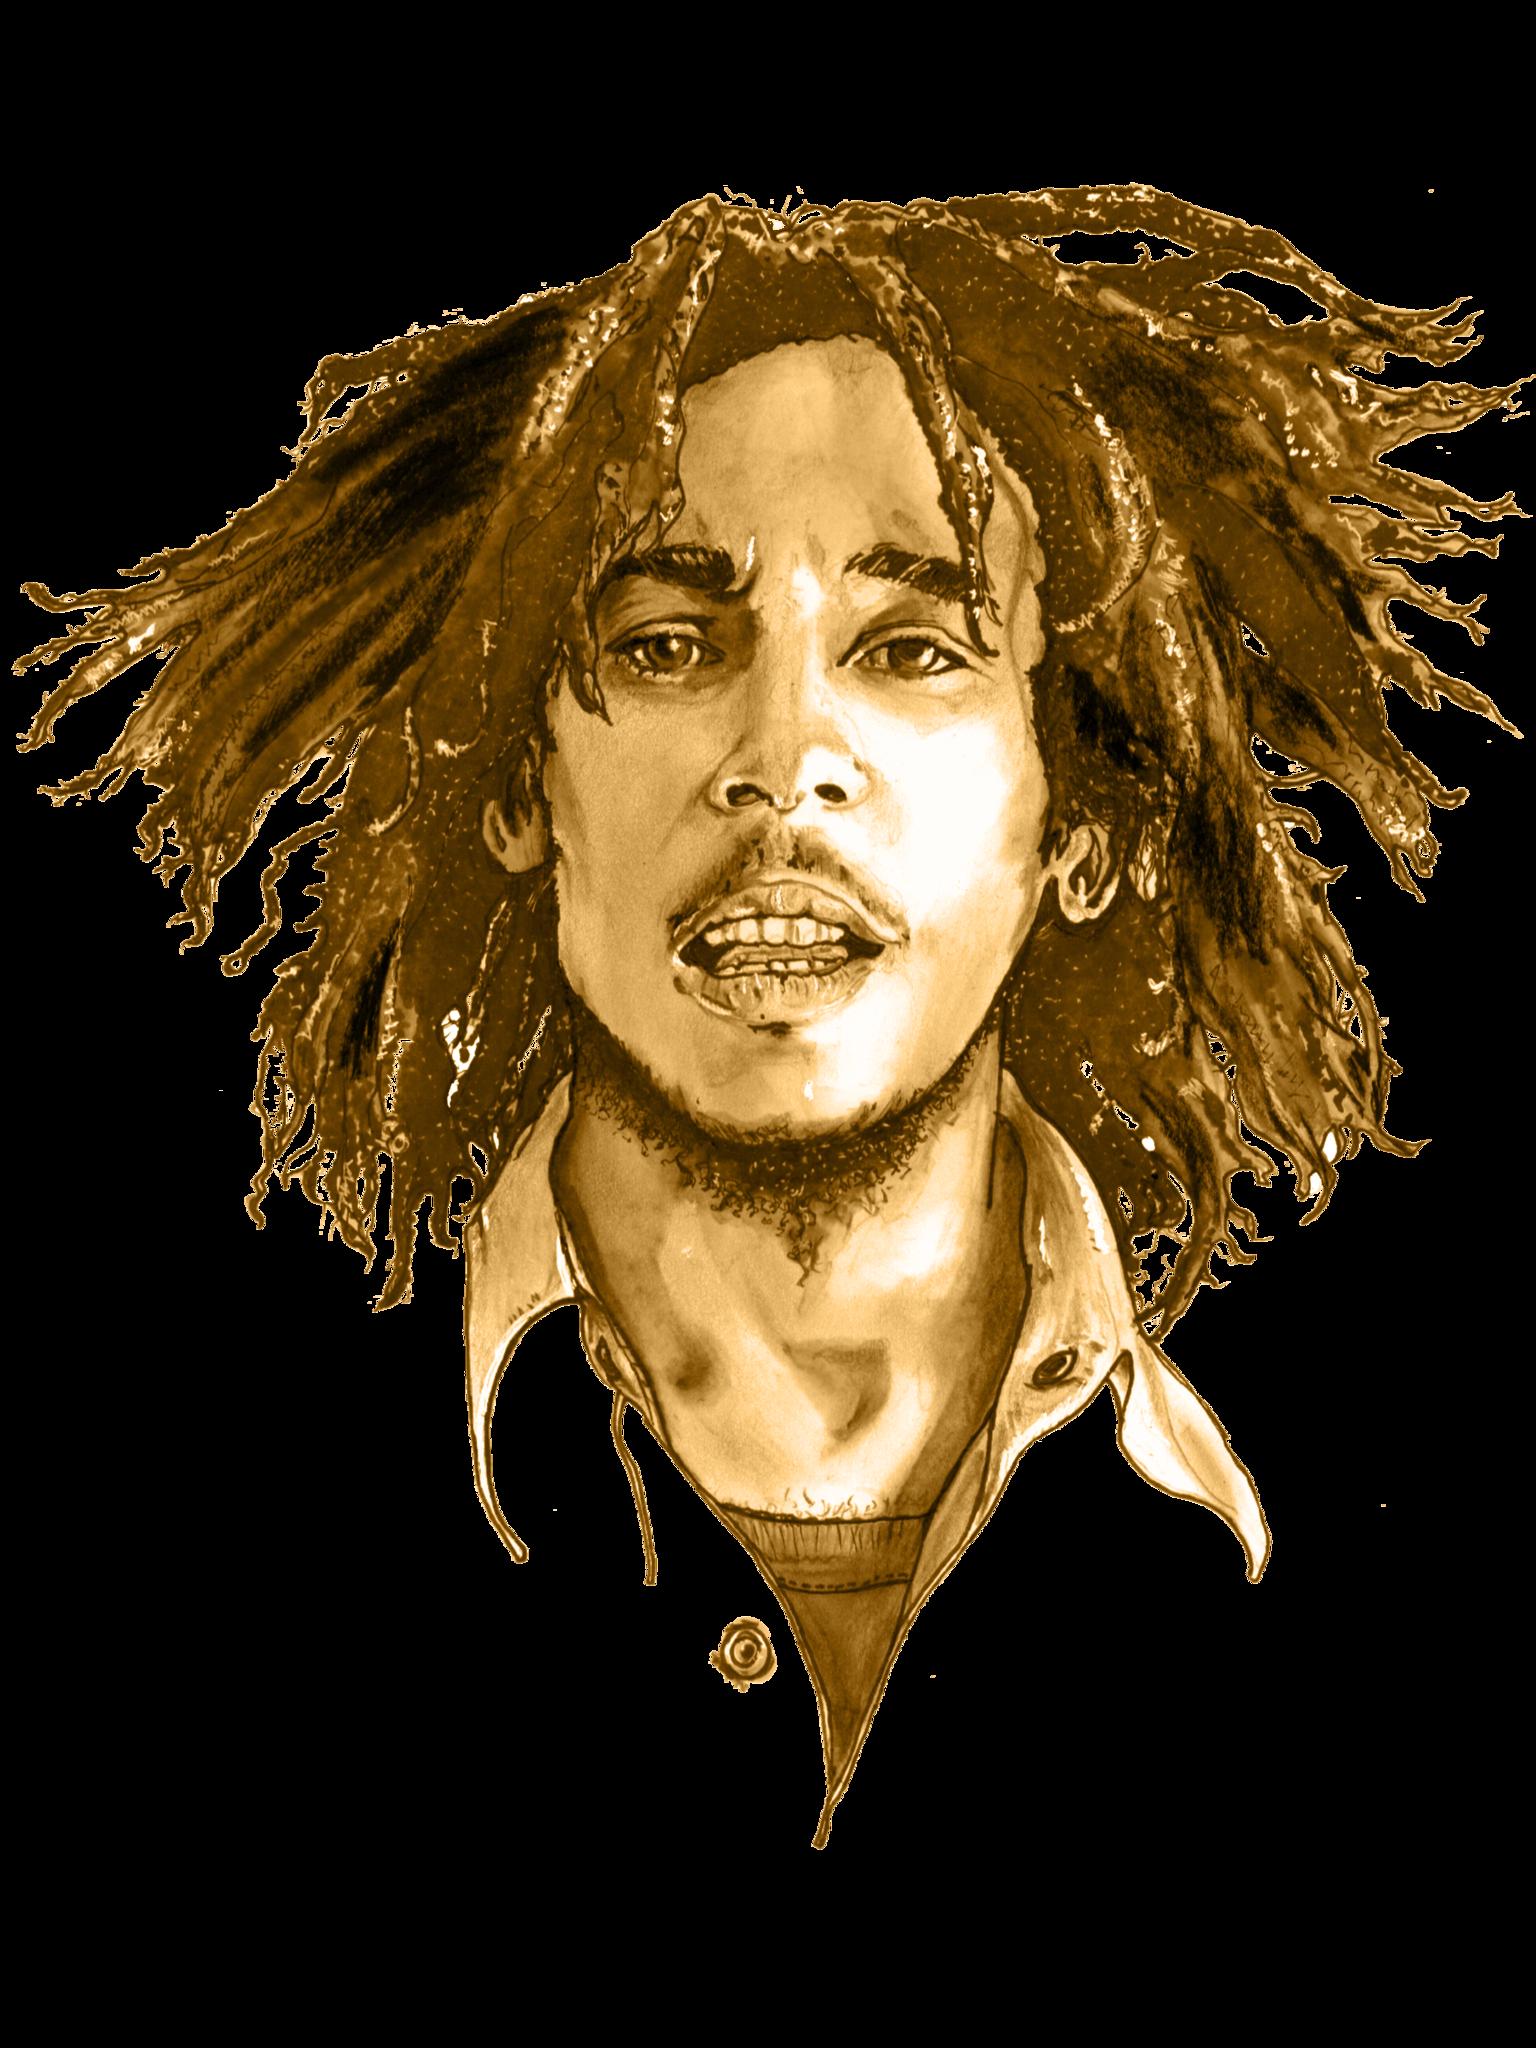 Bob Marley Png Image Bob Marley Bob Marley Art Marley